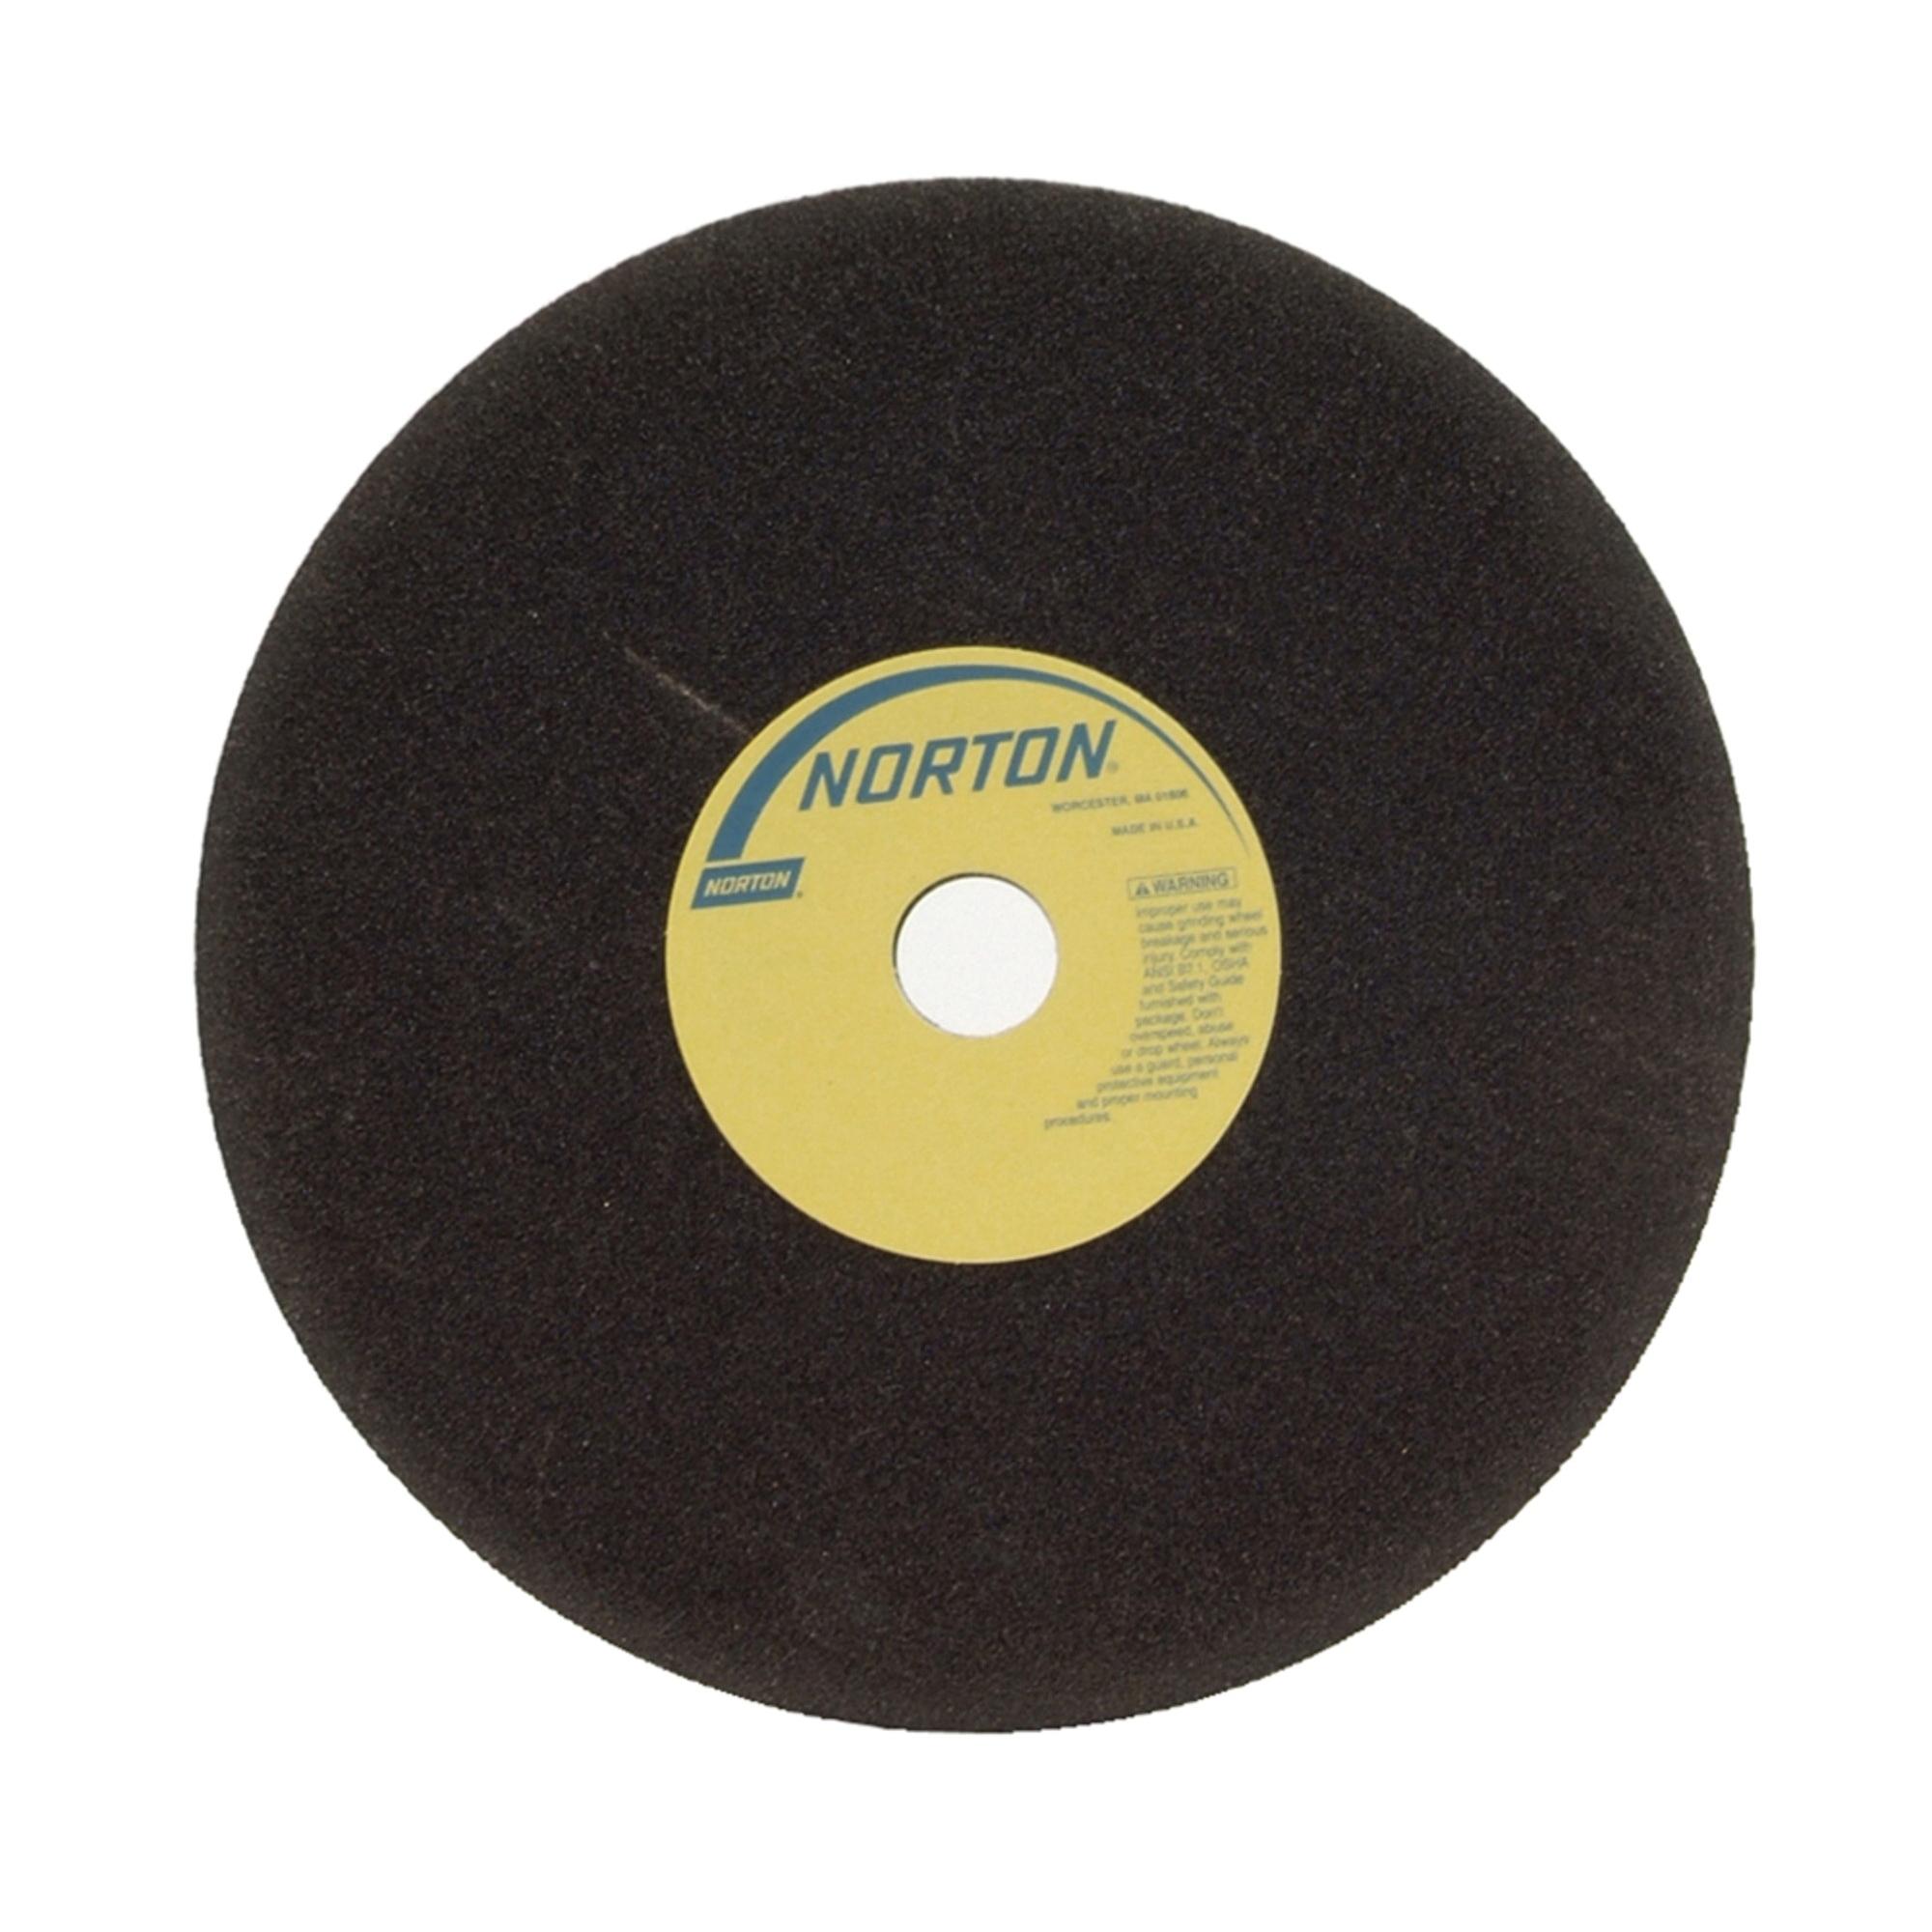 Norton® NorZon® 66253262307 NZ Straight Sawgumming Wheel, 12 in Dia x 3/4 in THK, 1-1/4 in Center Hole, 36 Grit, Zirconia Alumina Abrasive